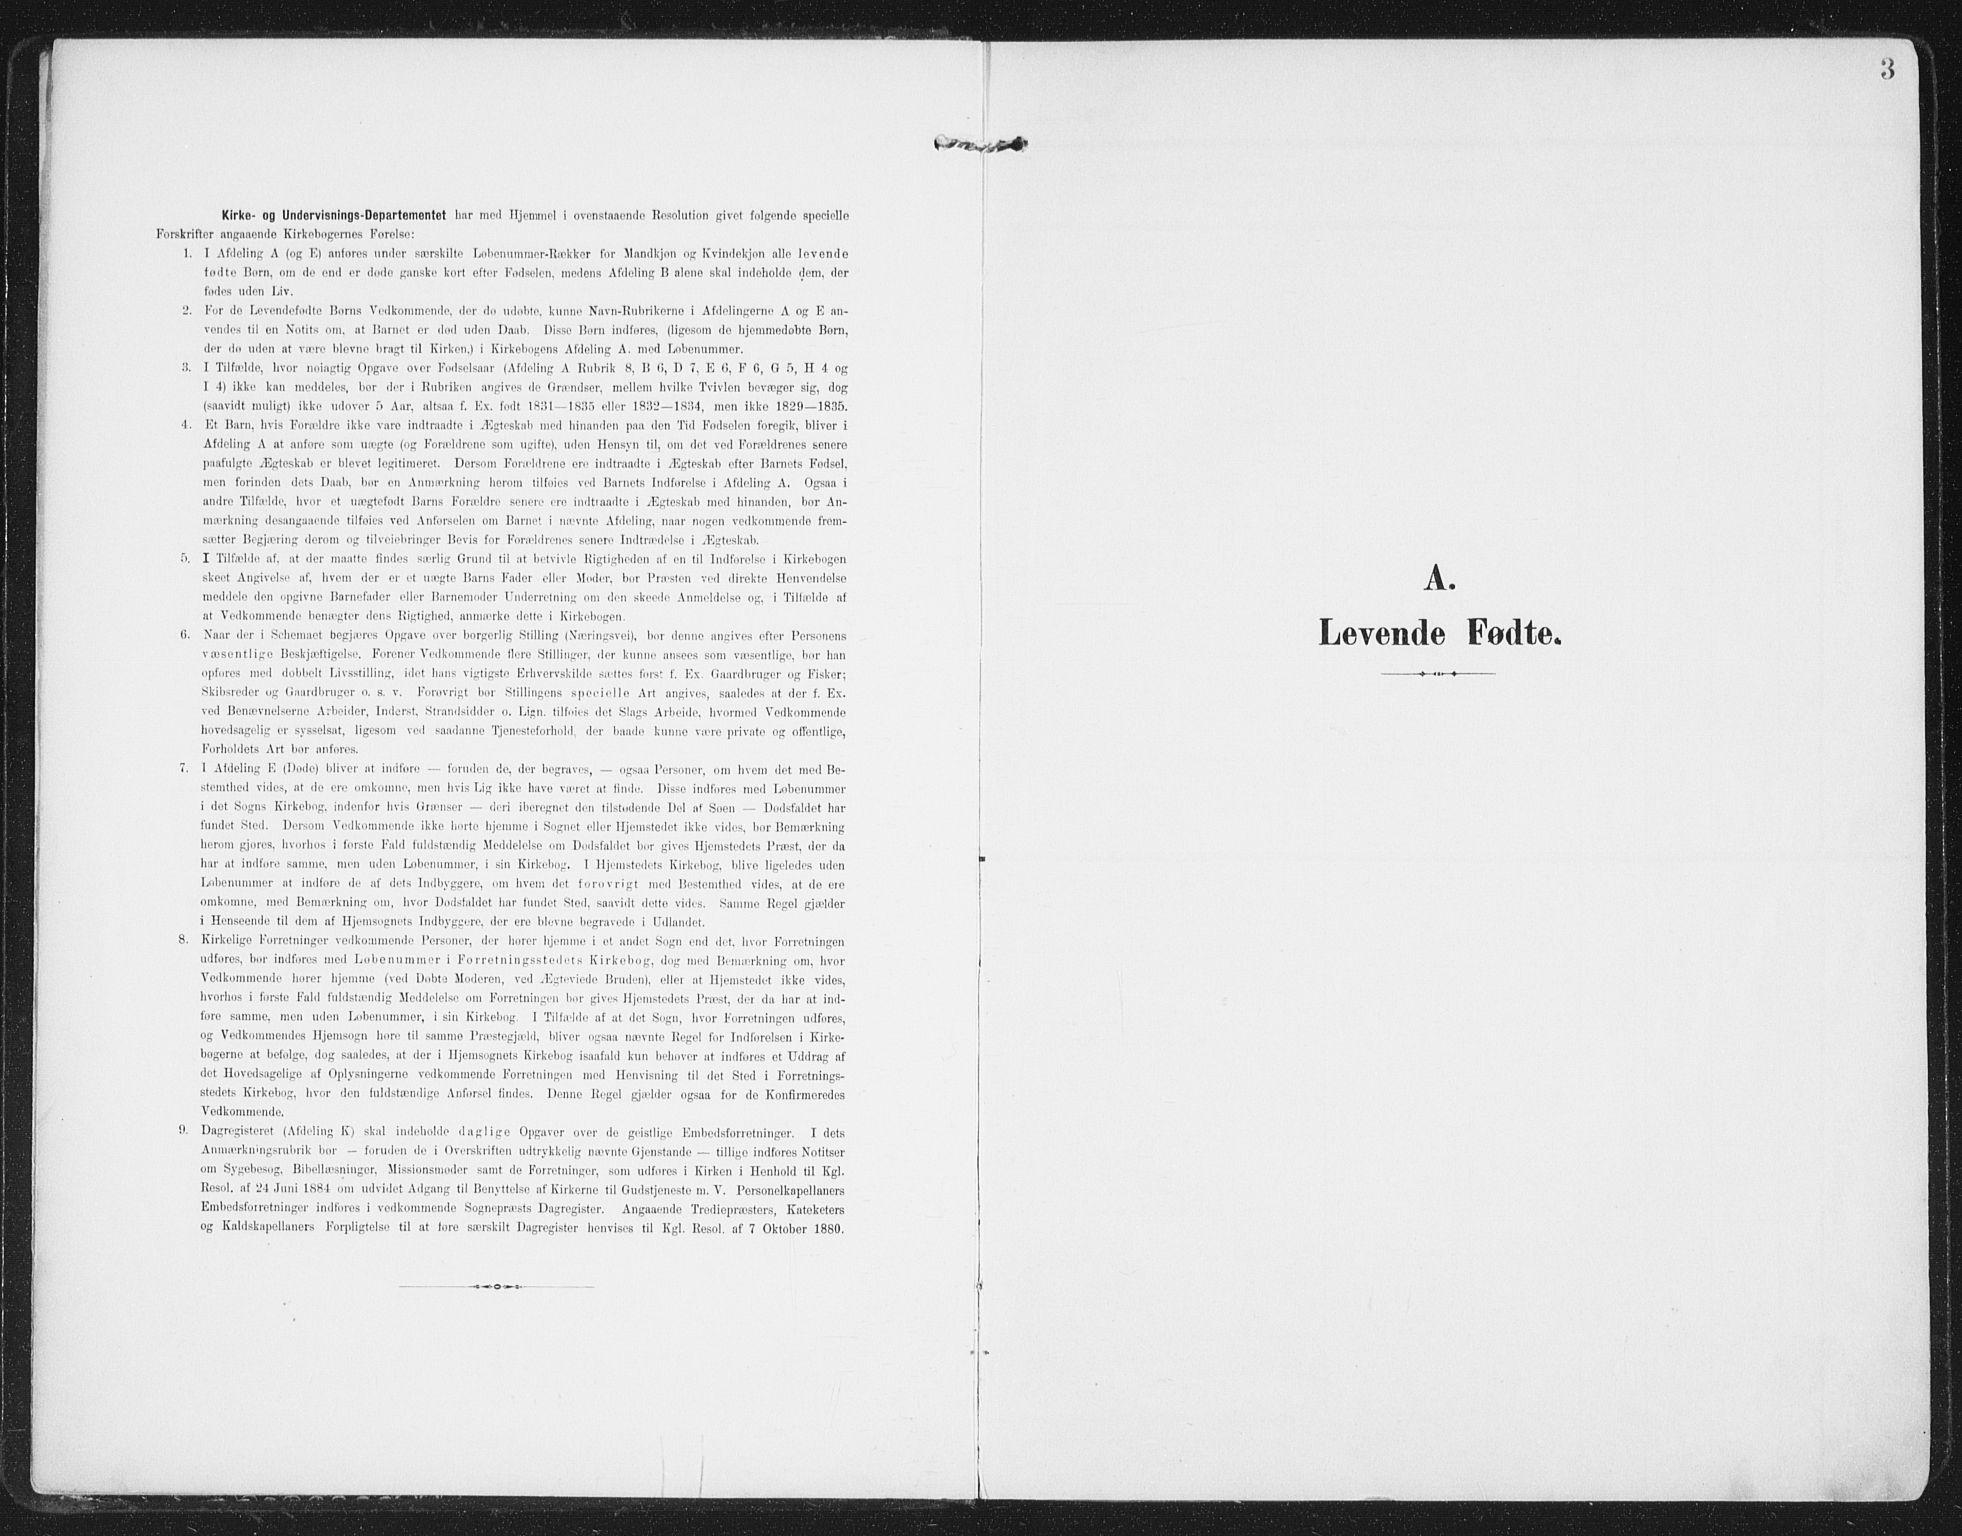 SAT, Ministerialprotokoller, klokkerbøker og fødselsregistre - Nordland, 827/L0402: Ministerialbok nr. 827A14, 1903-1912, s. 3